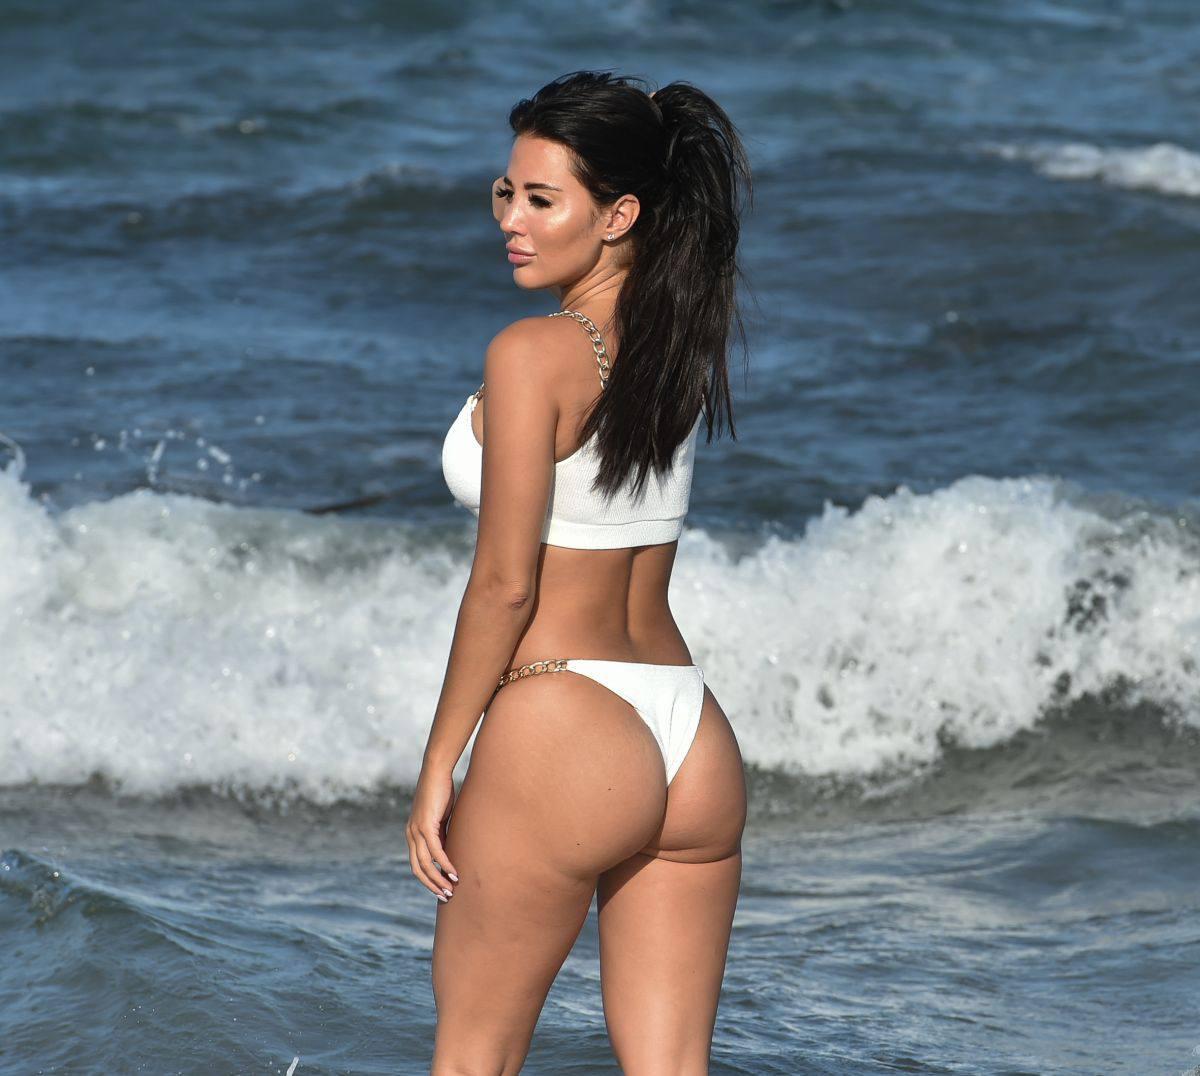 Yazmin Oukhellou In White Bikini